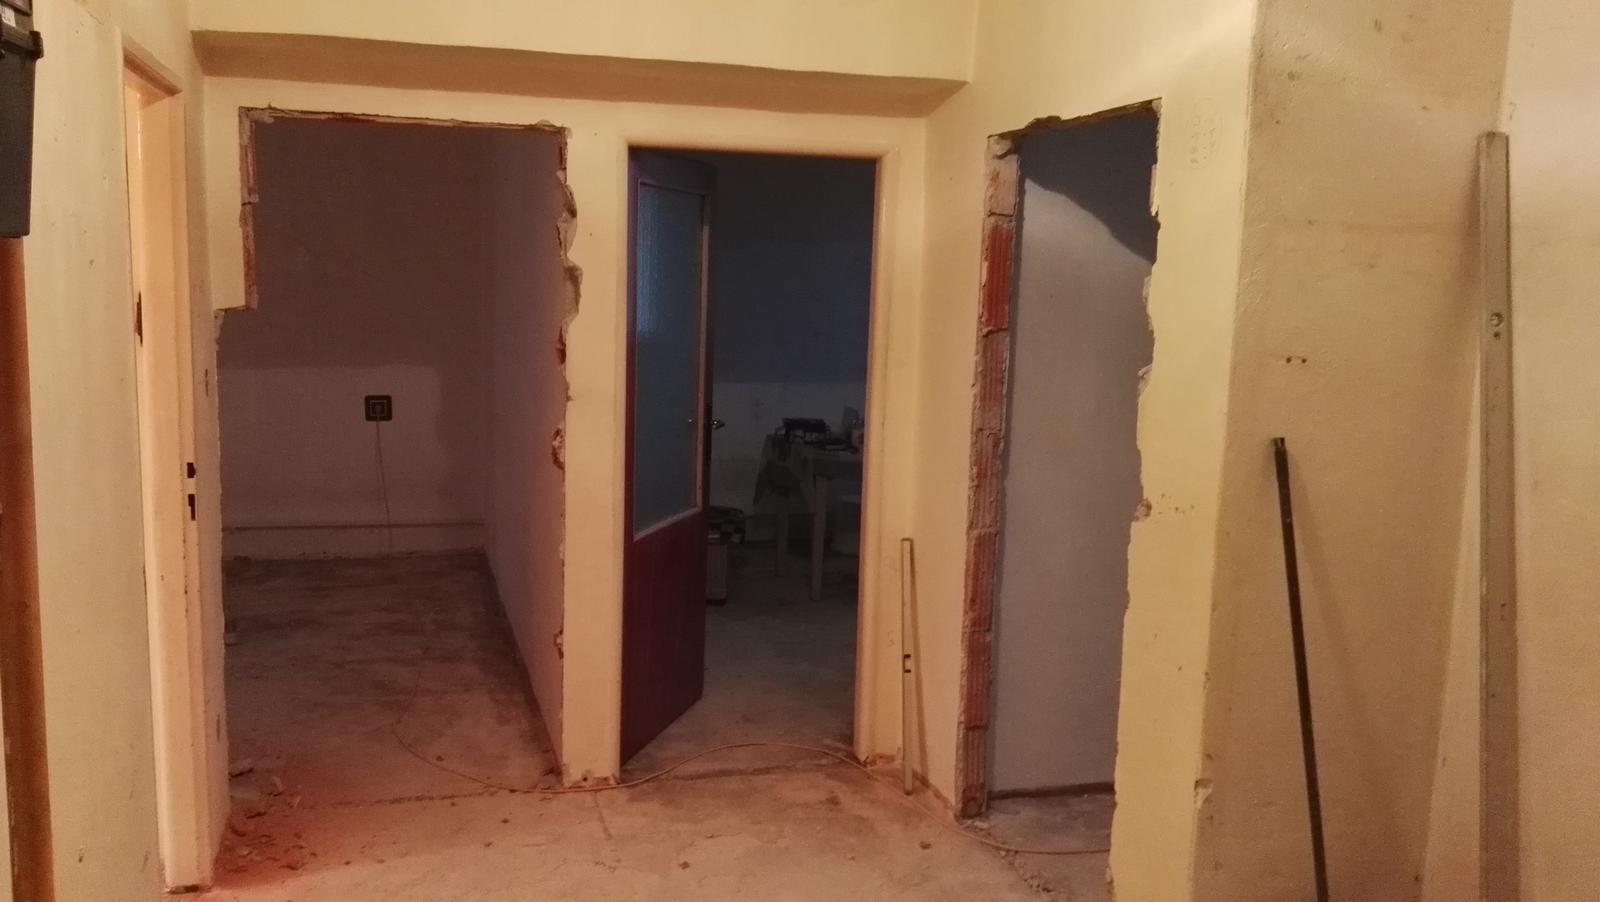 Projekt: Nové bývanie ... - ... vytrhané podlahy a vybraté zárubne ...